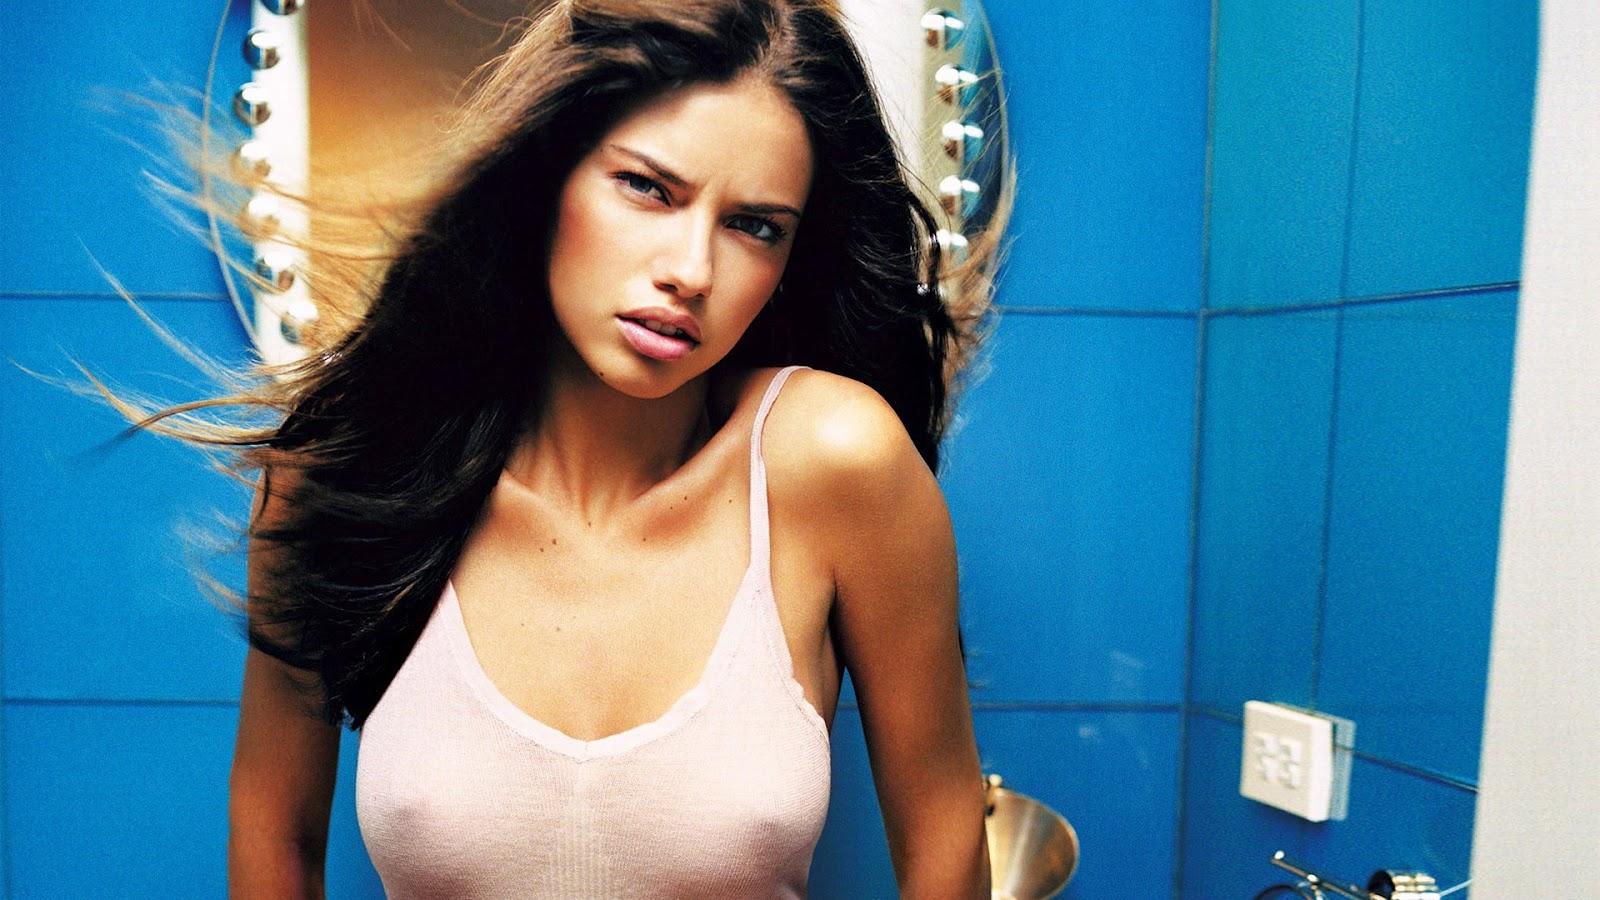 Victorias Secret Angel Adriana Lima Wallpapers